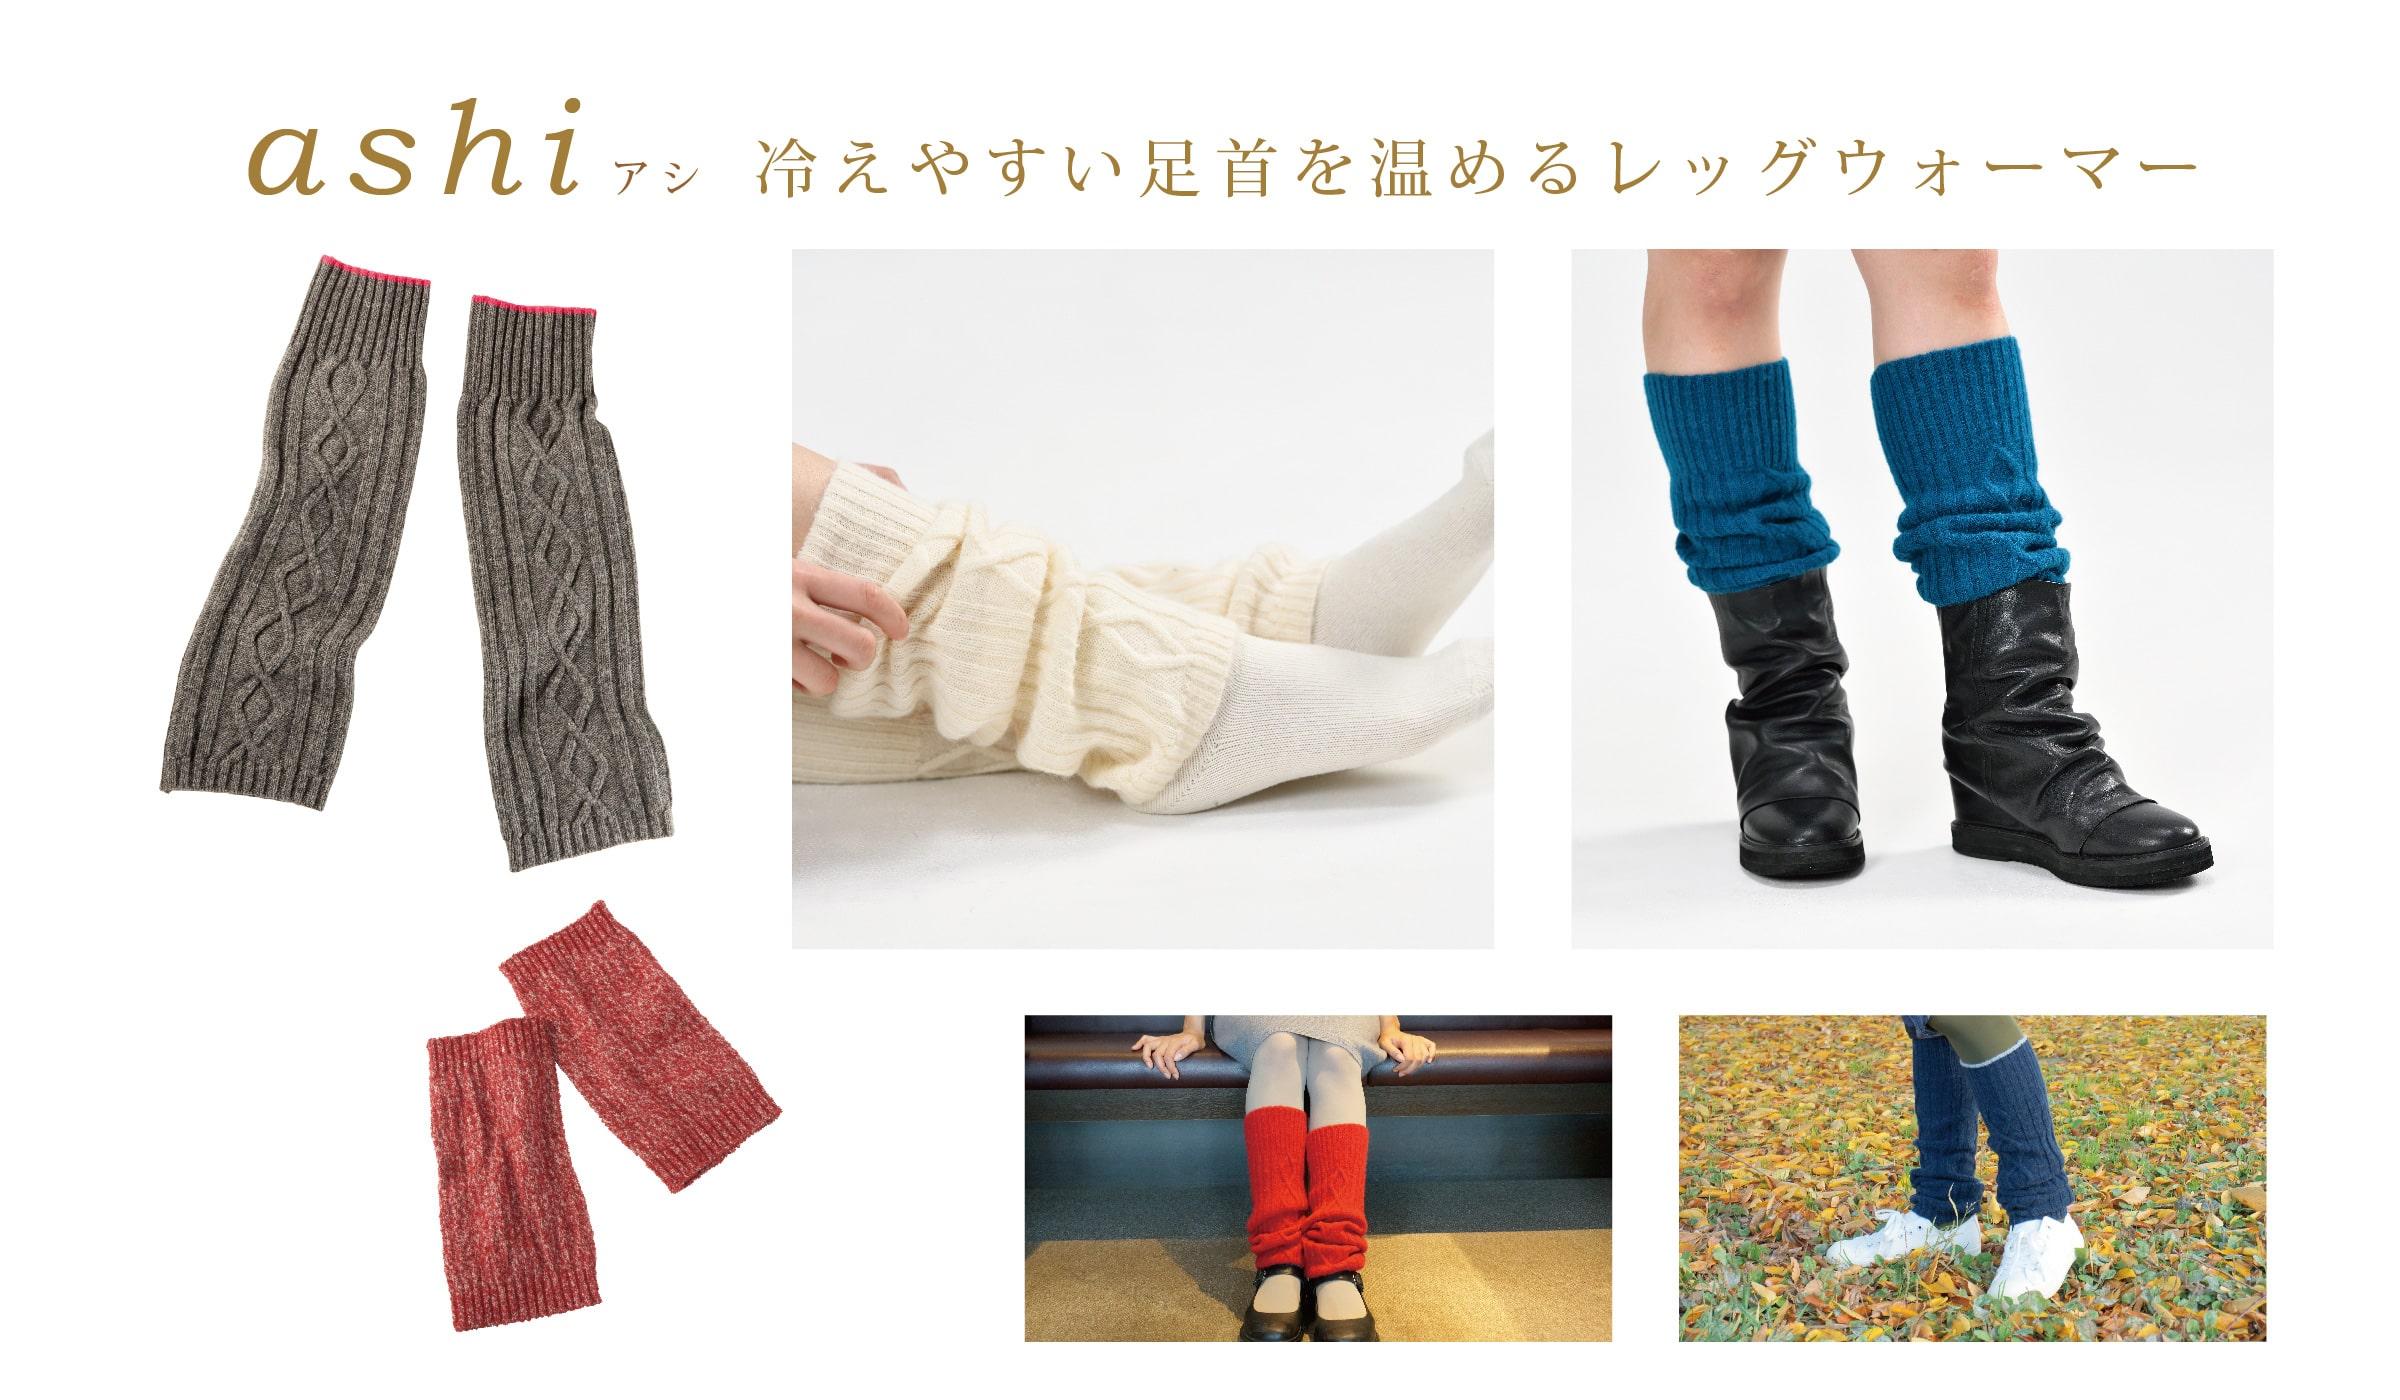 ashi(アシ)